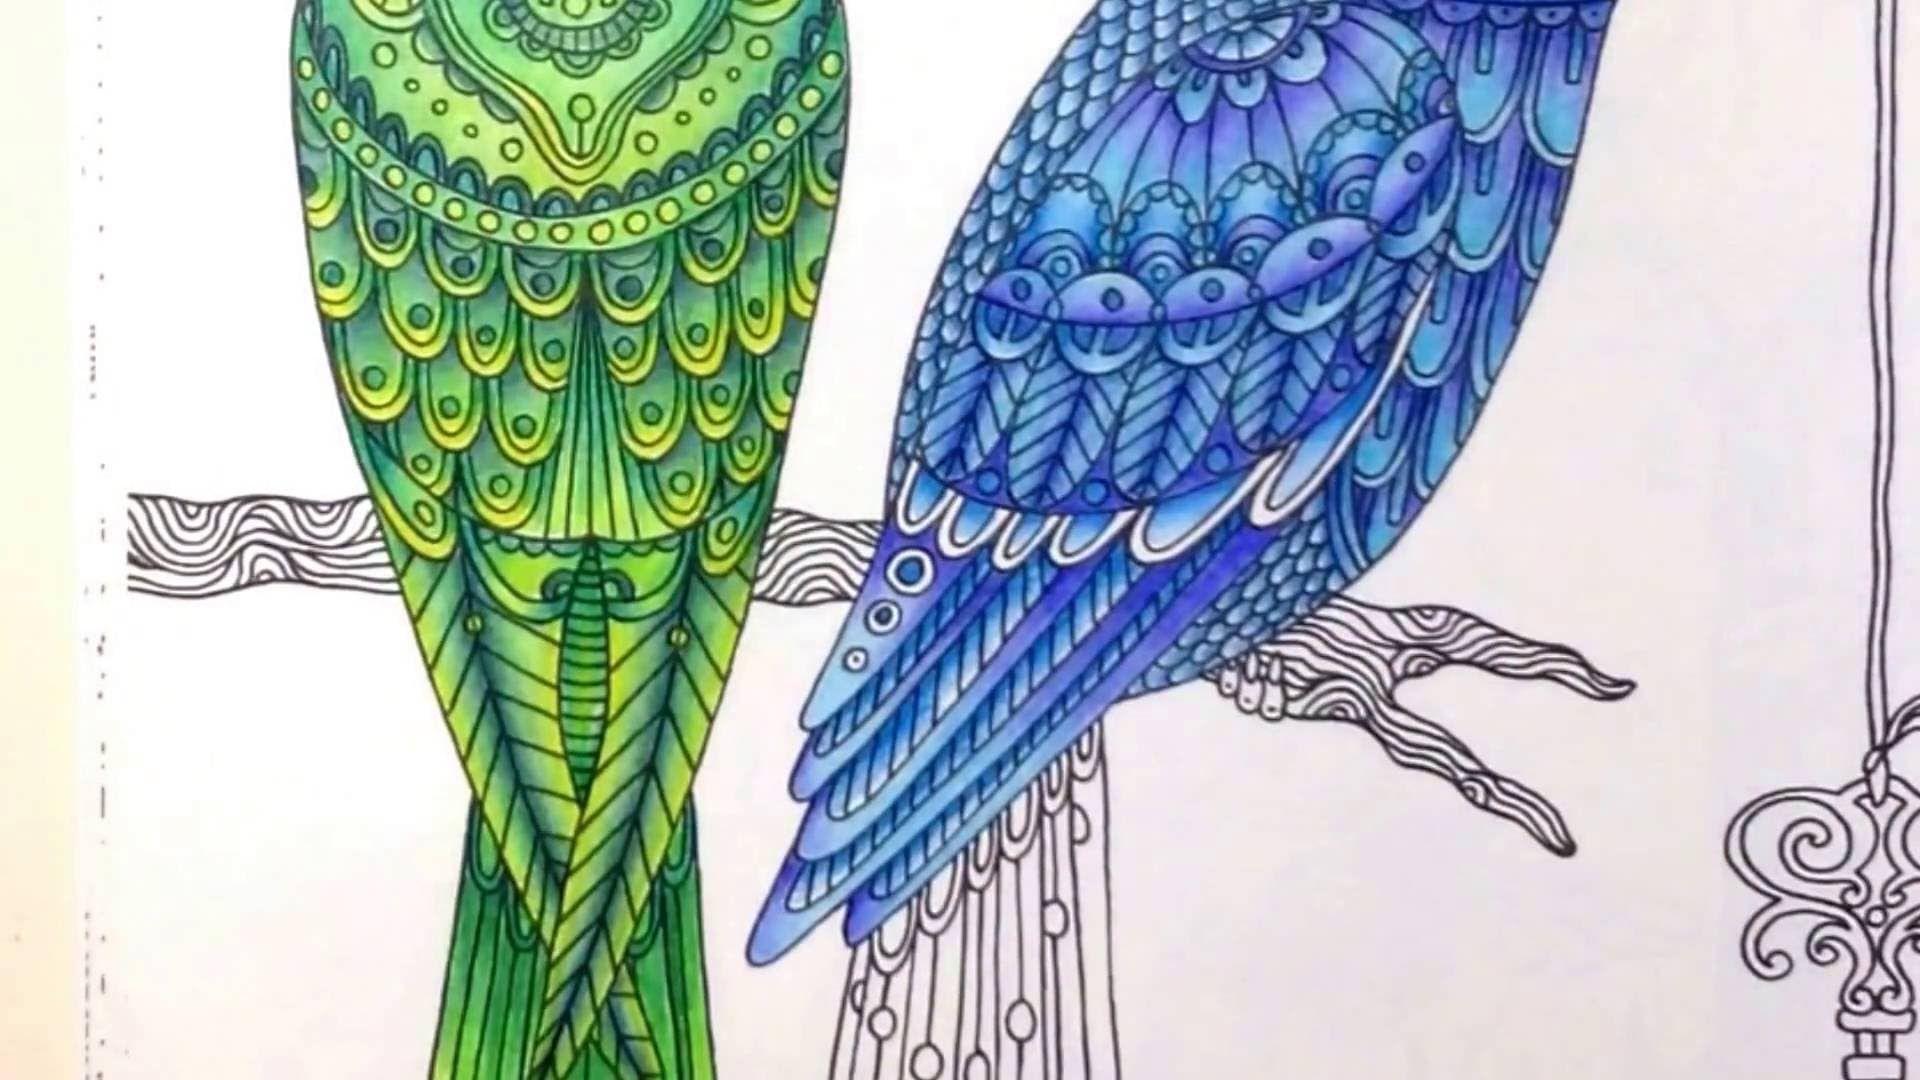 Dagdrömmar/daydreams - coloring a blue bird - part 2 - realtime coloring